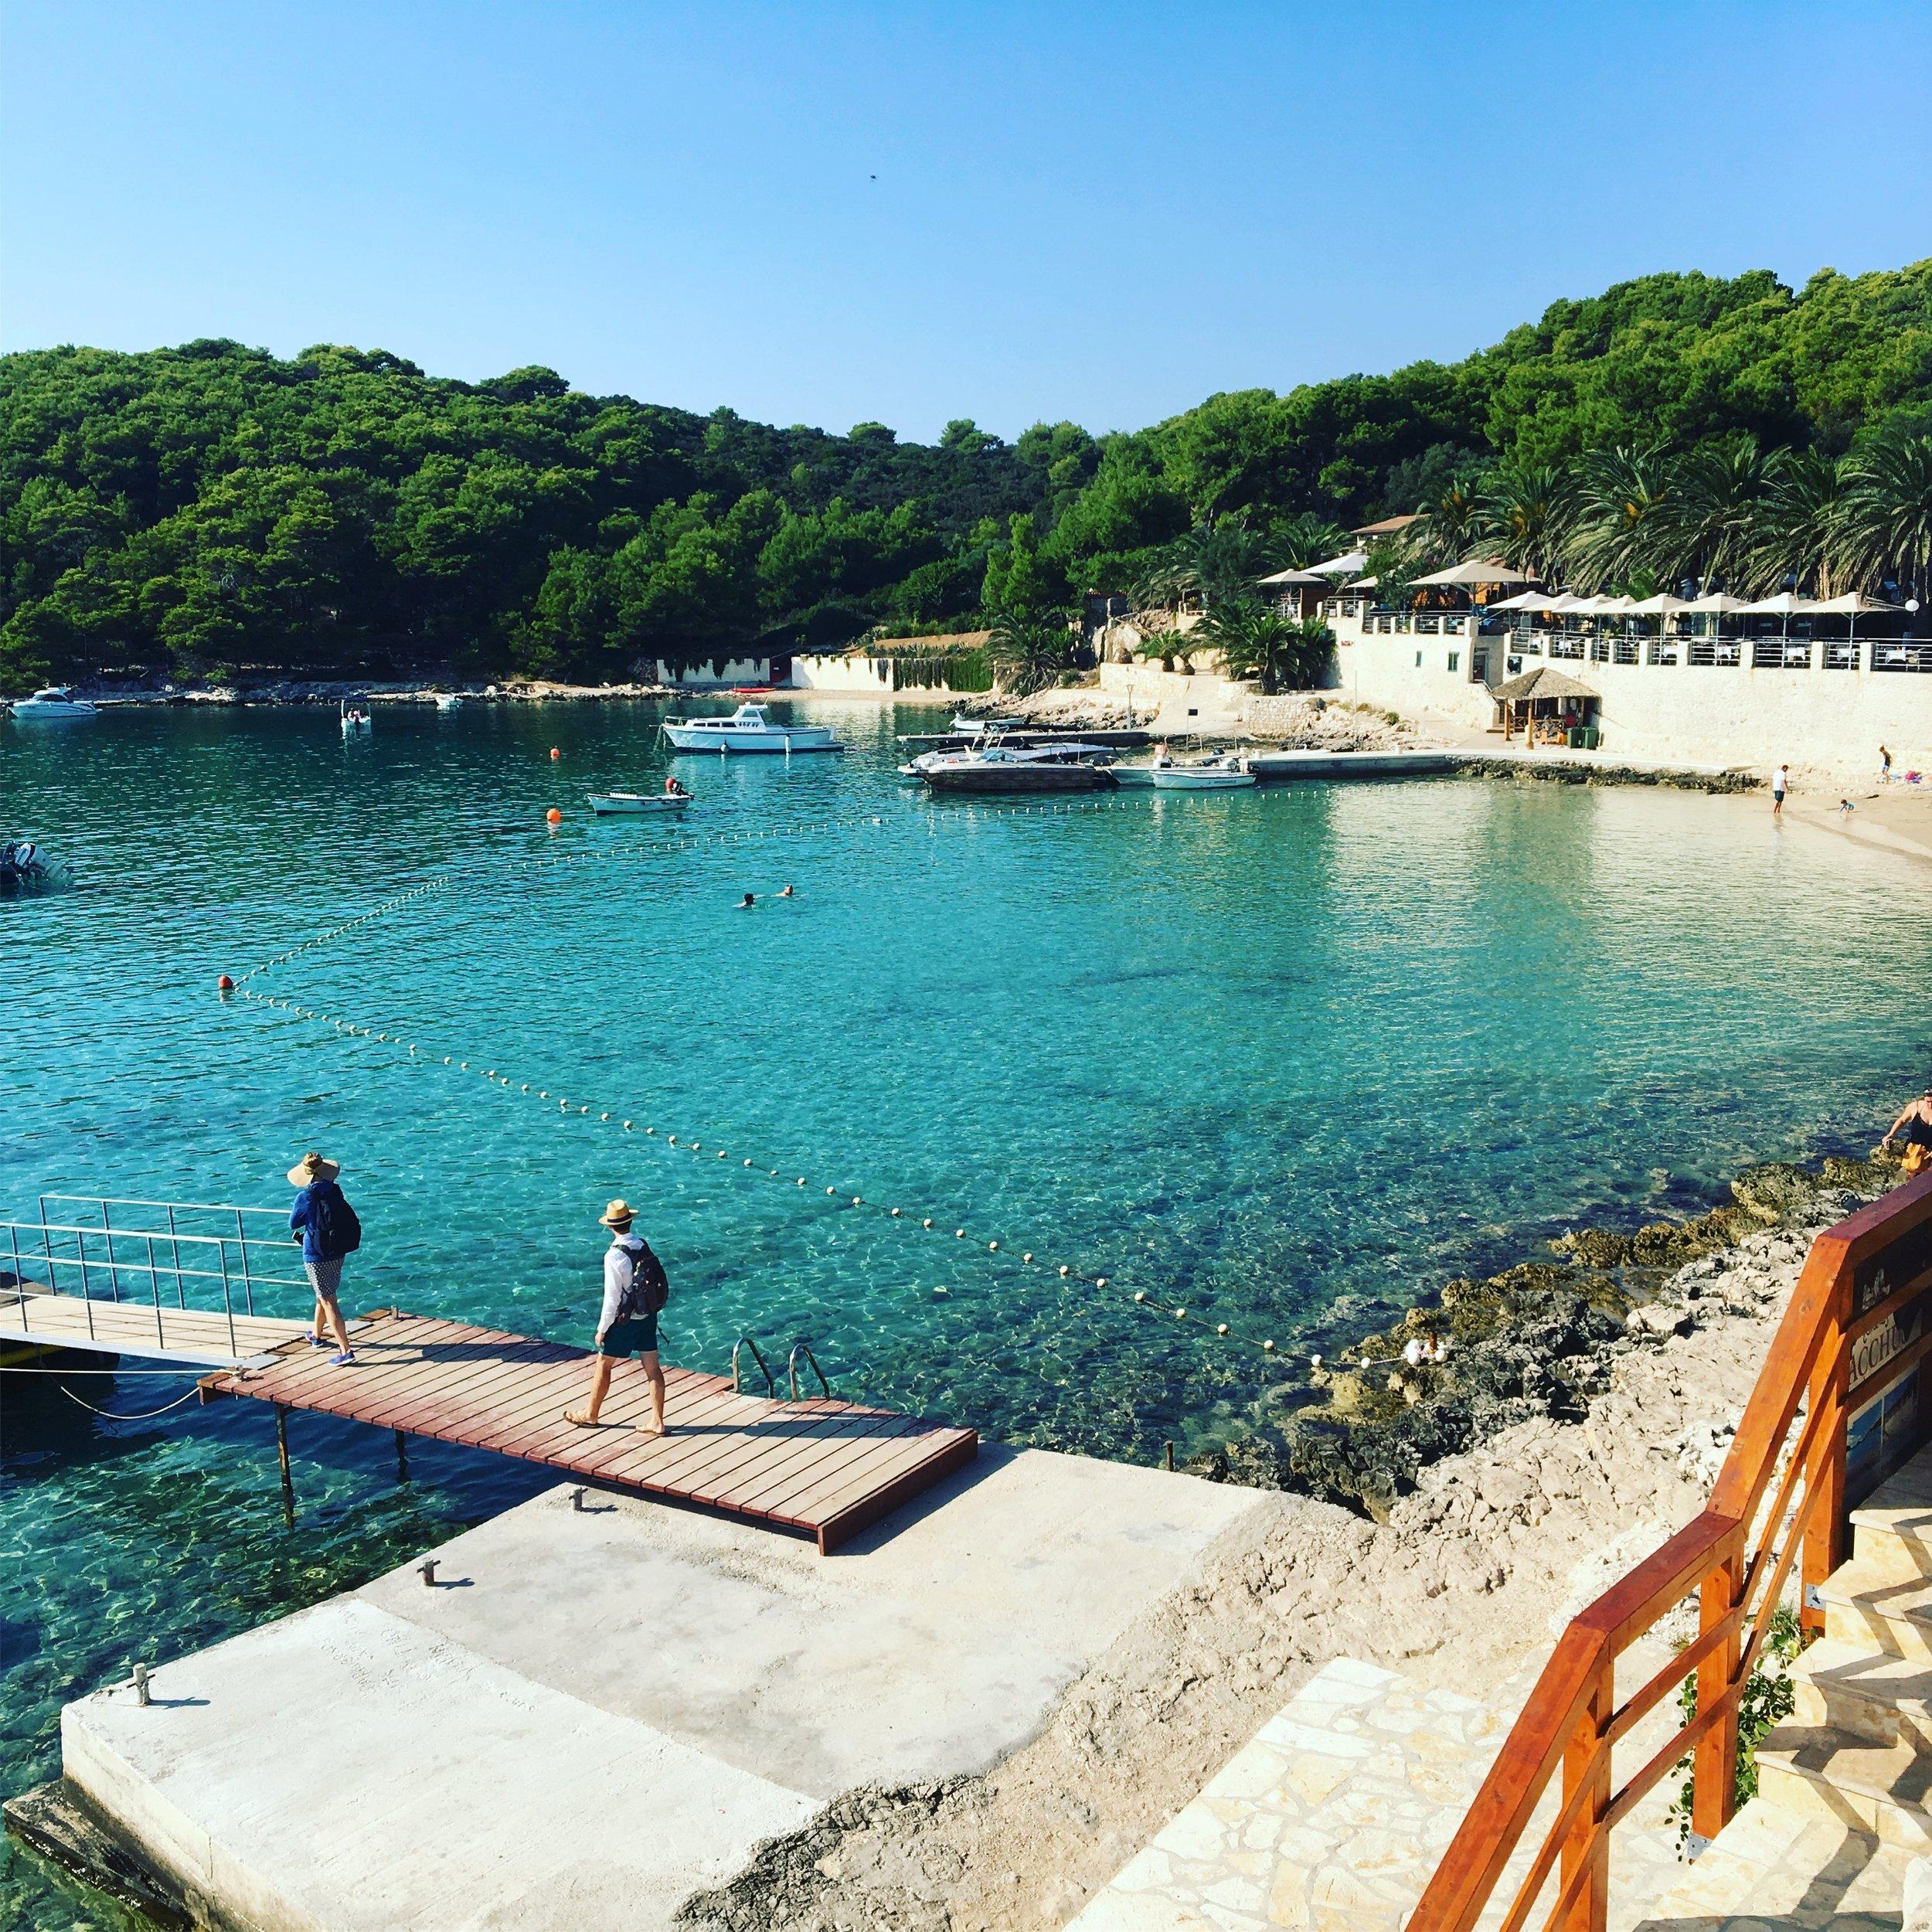 Palmizana Island, Croatia